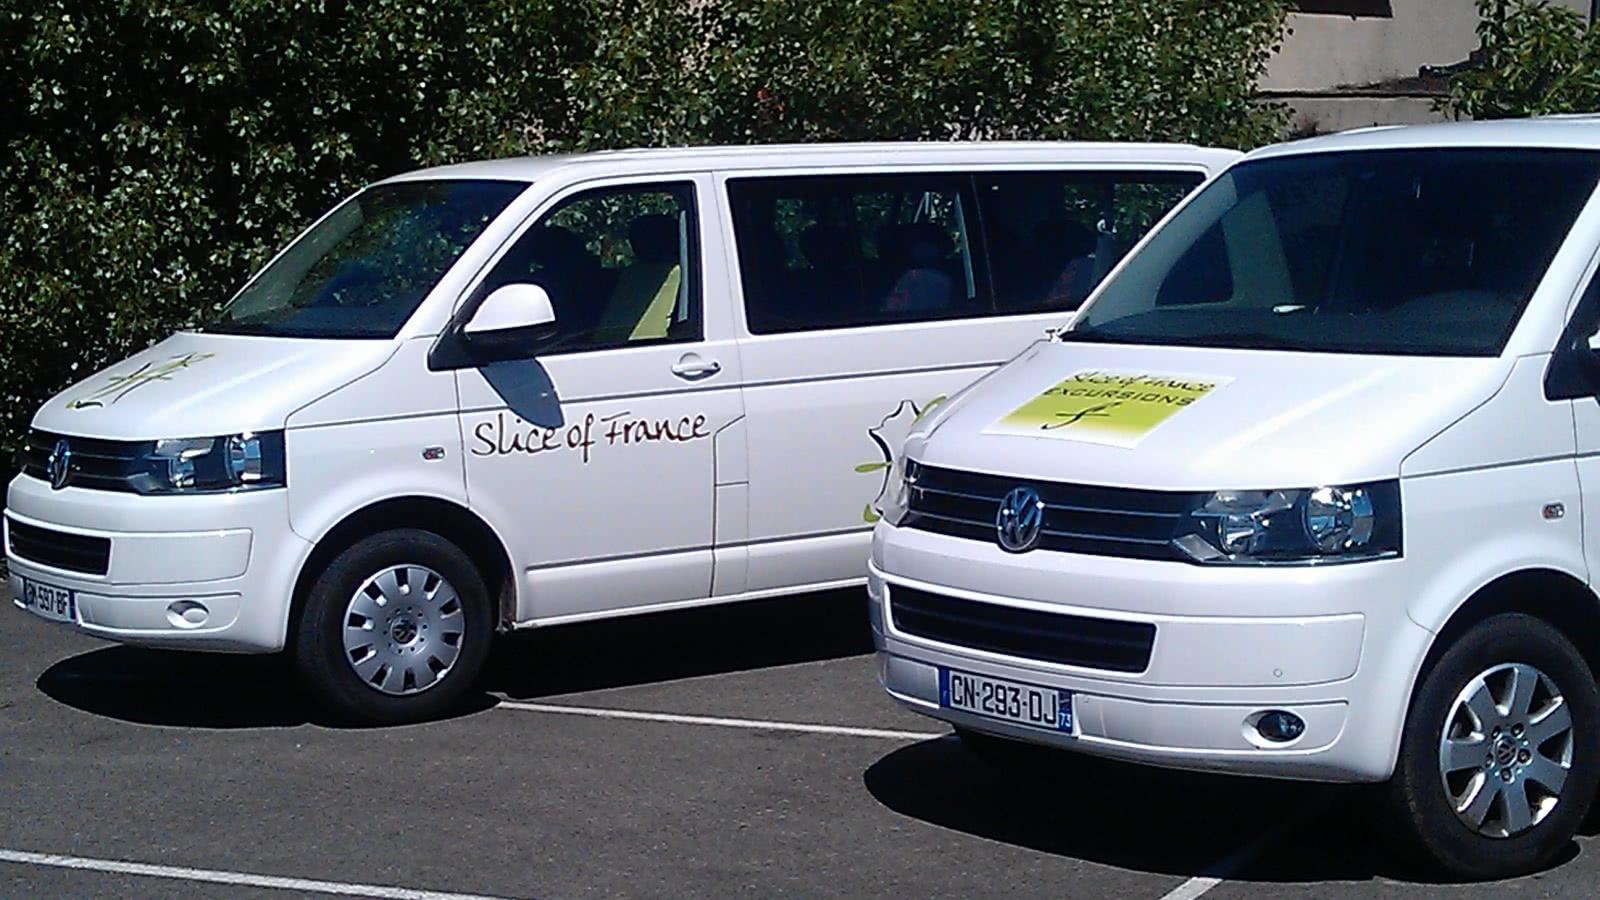 Transport SoF